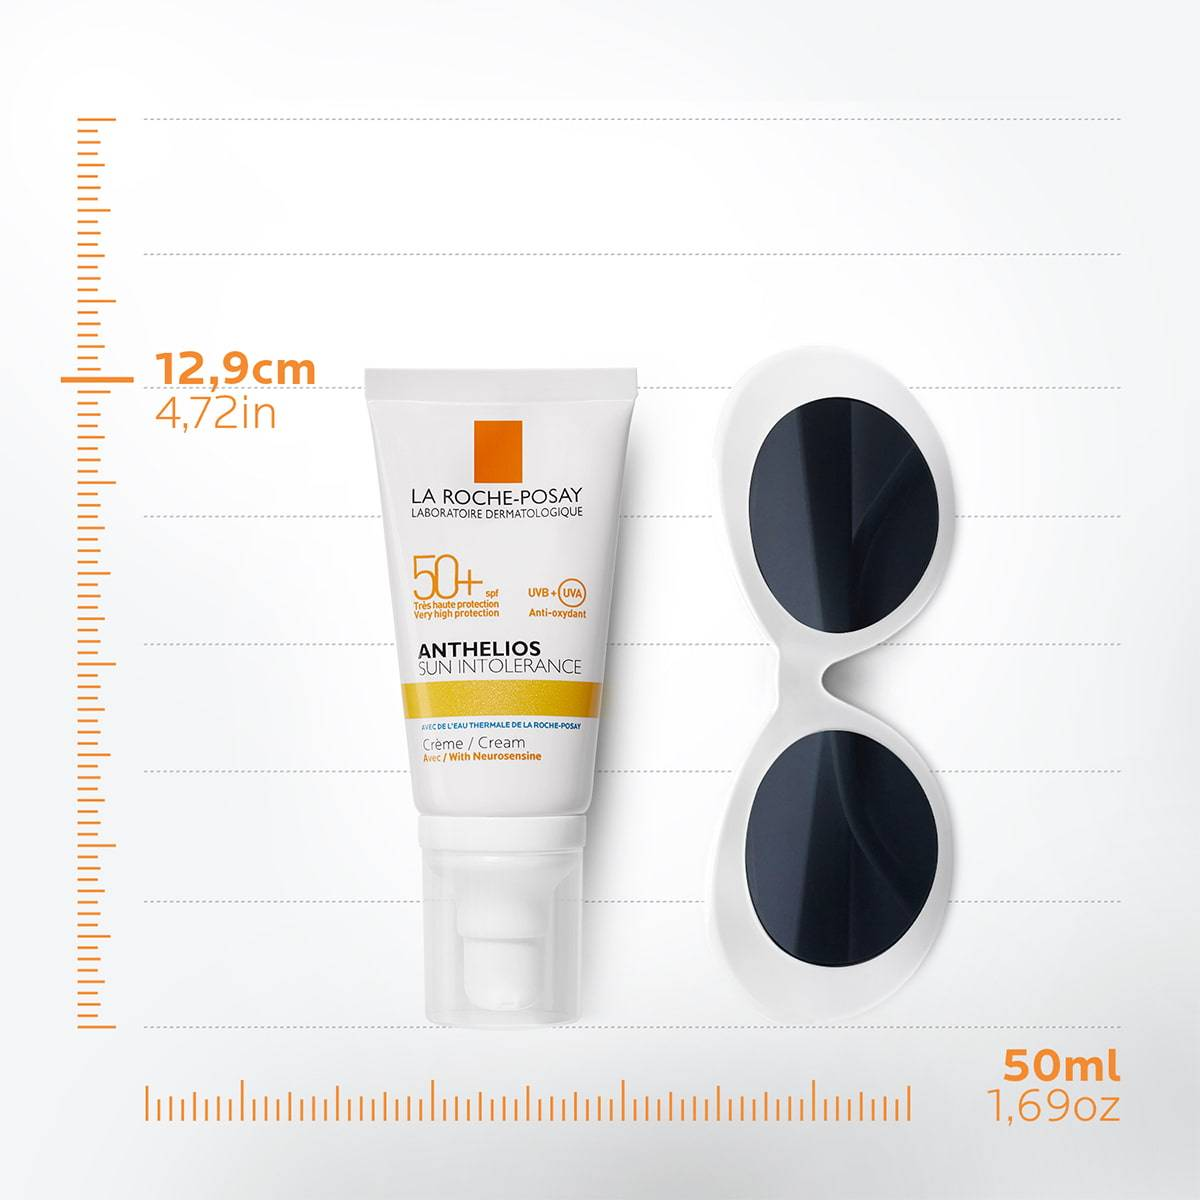 Słońce Anthelios Med Sun Intolerance Spf 50 50 ml | La Roche Posay 1